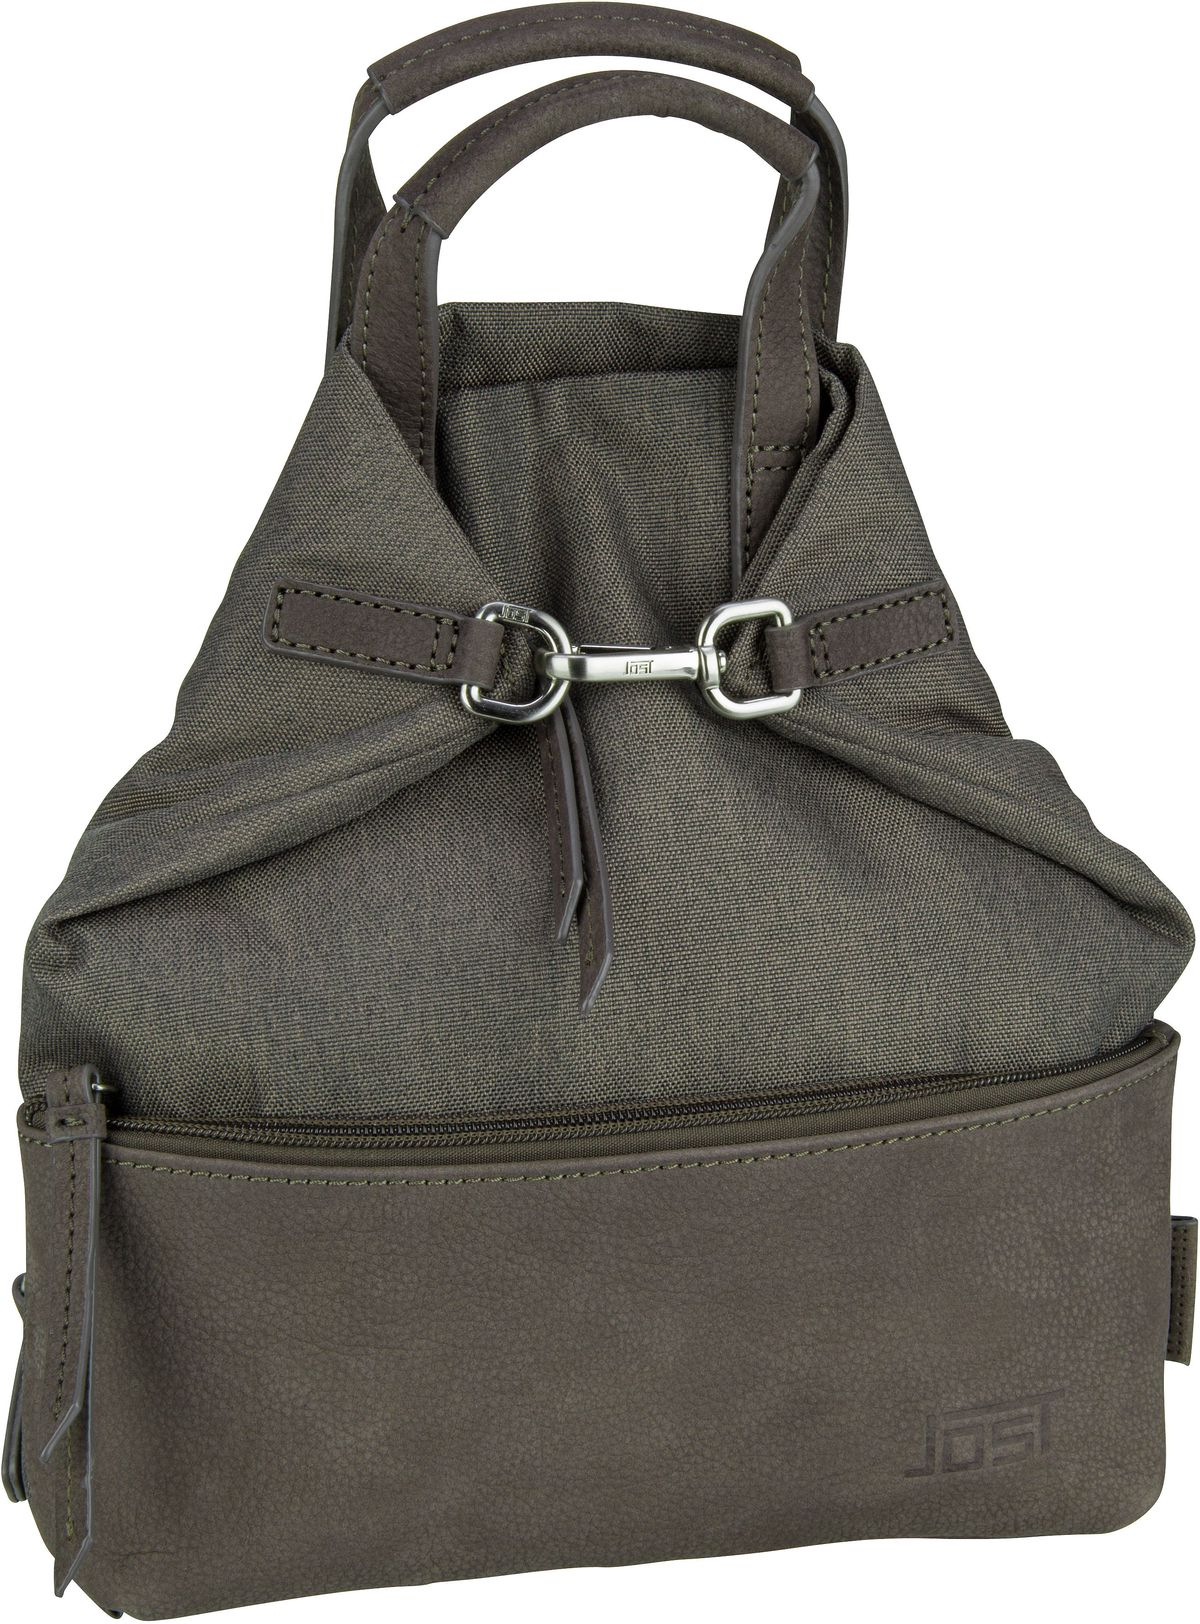 Jost Rucksack / Daypack 2715 X-Change Bag Mini Taupe